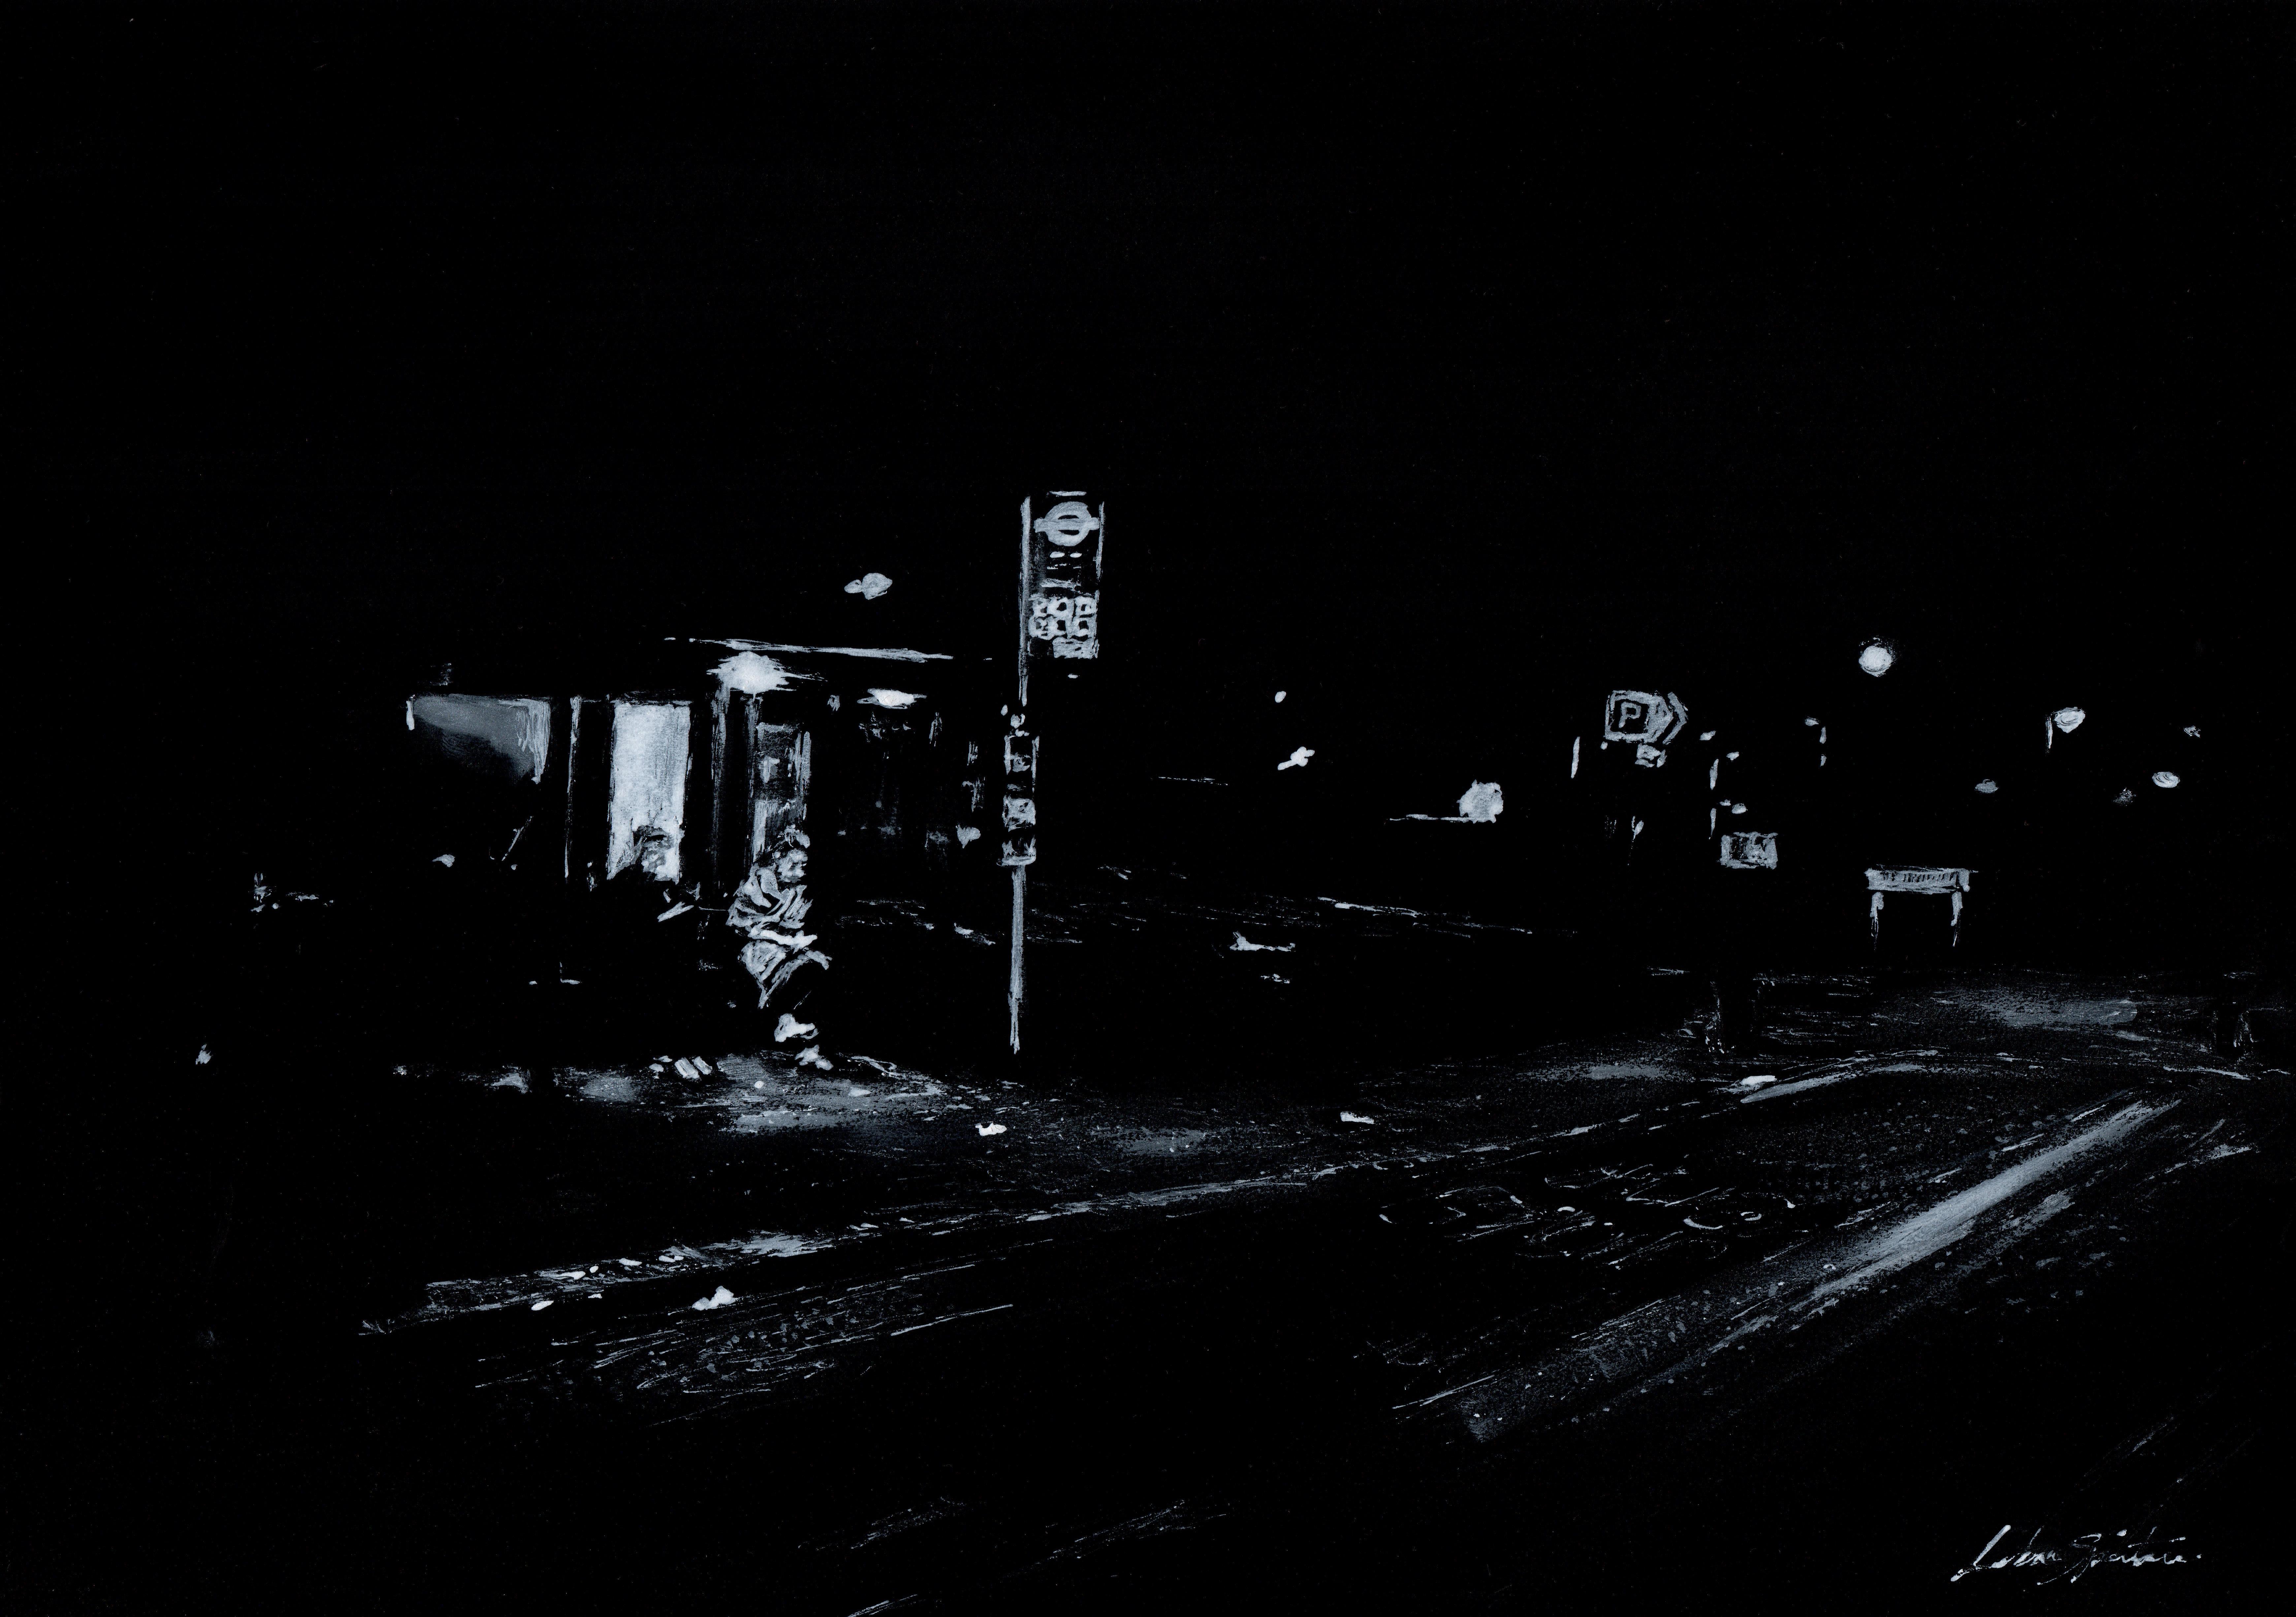 All Saints bus stop, Blackheath